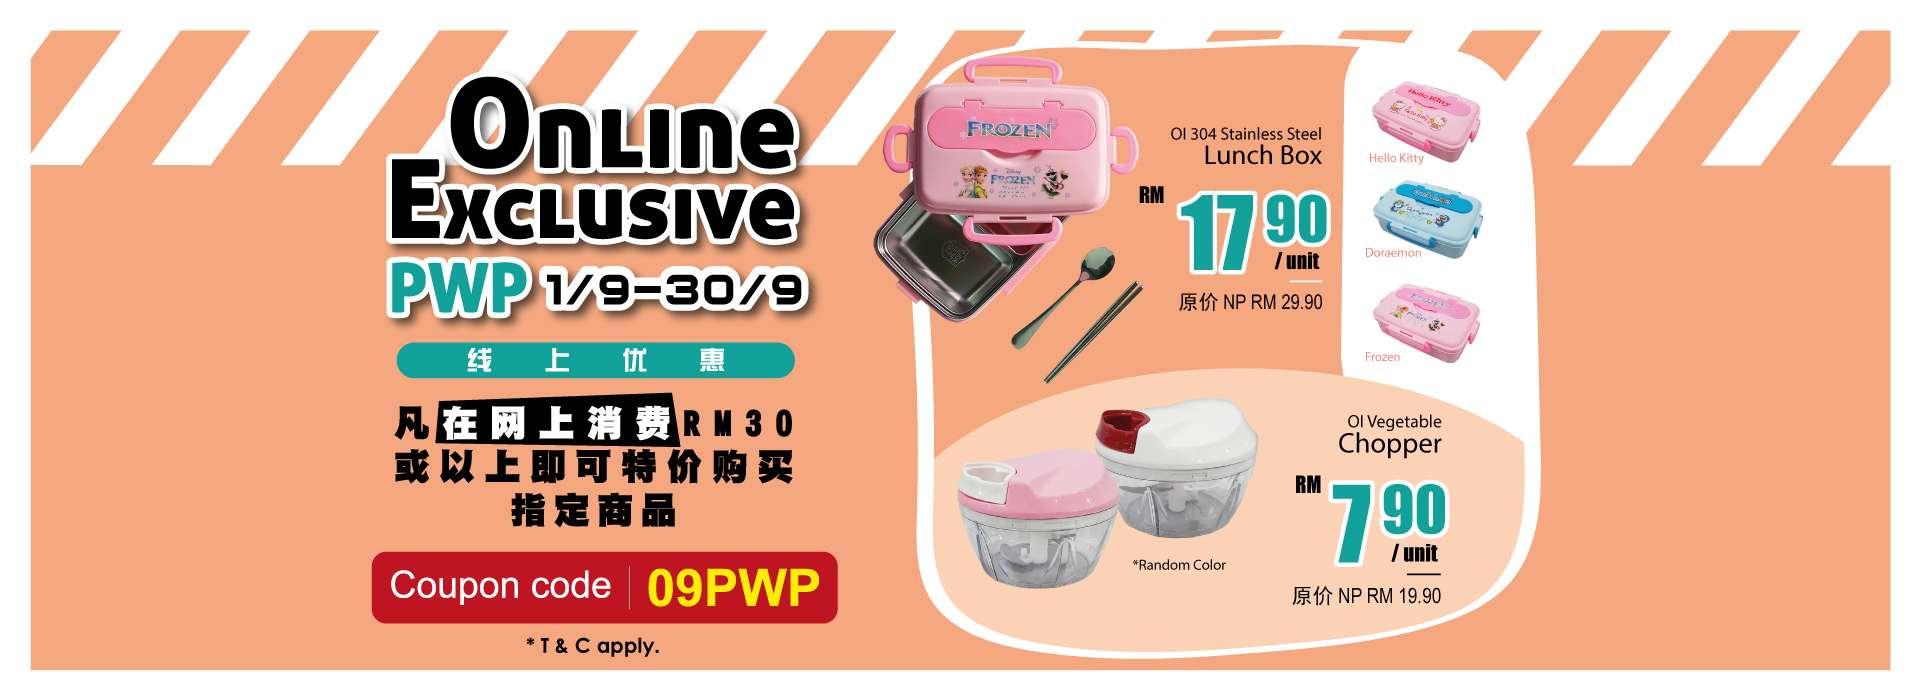 Sep Online Exclusive PWP